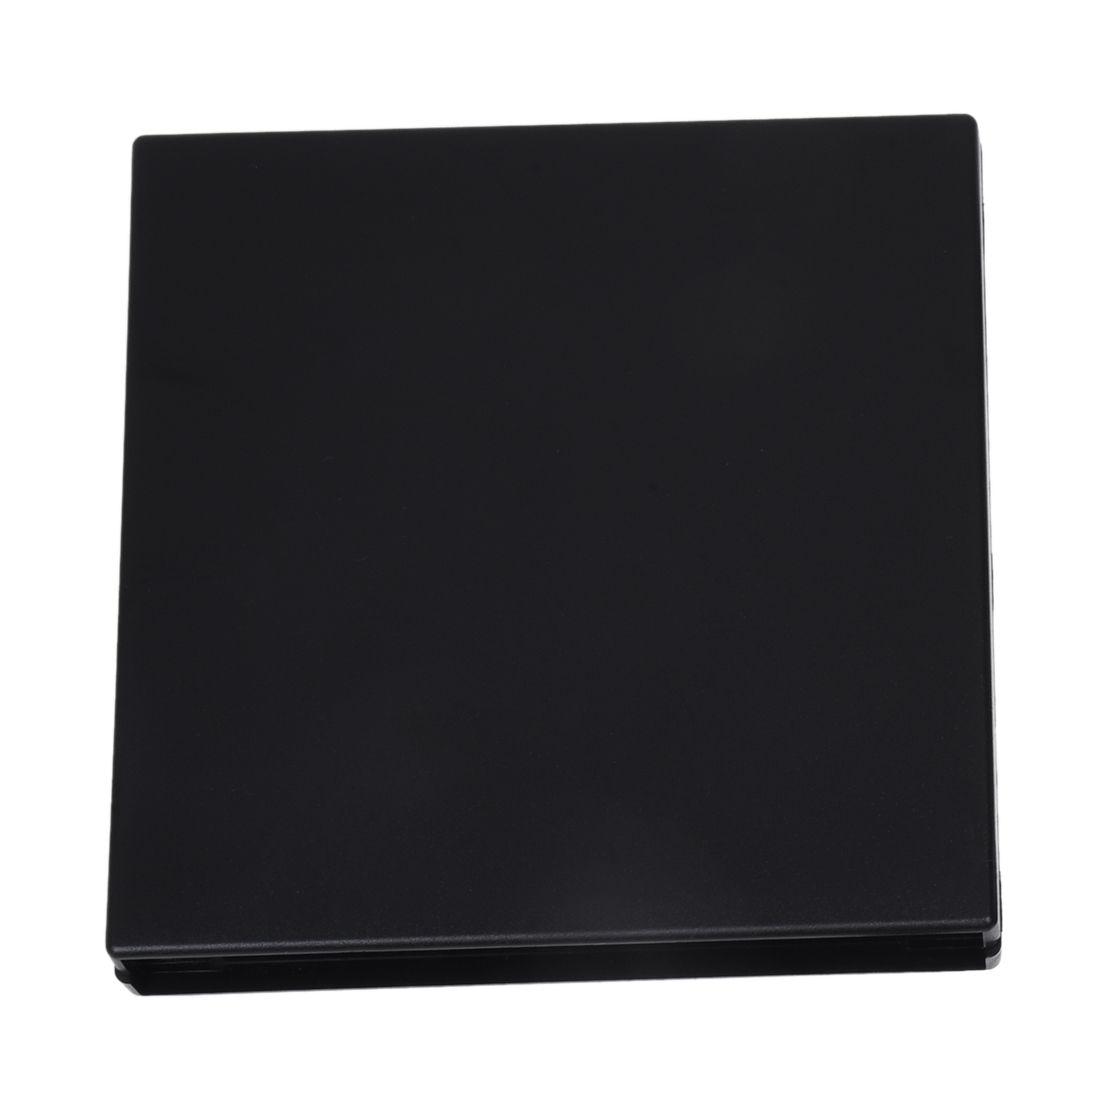 Laptop USB to Sata CD DVD RW Drive External Case Caddy